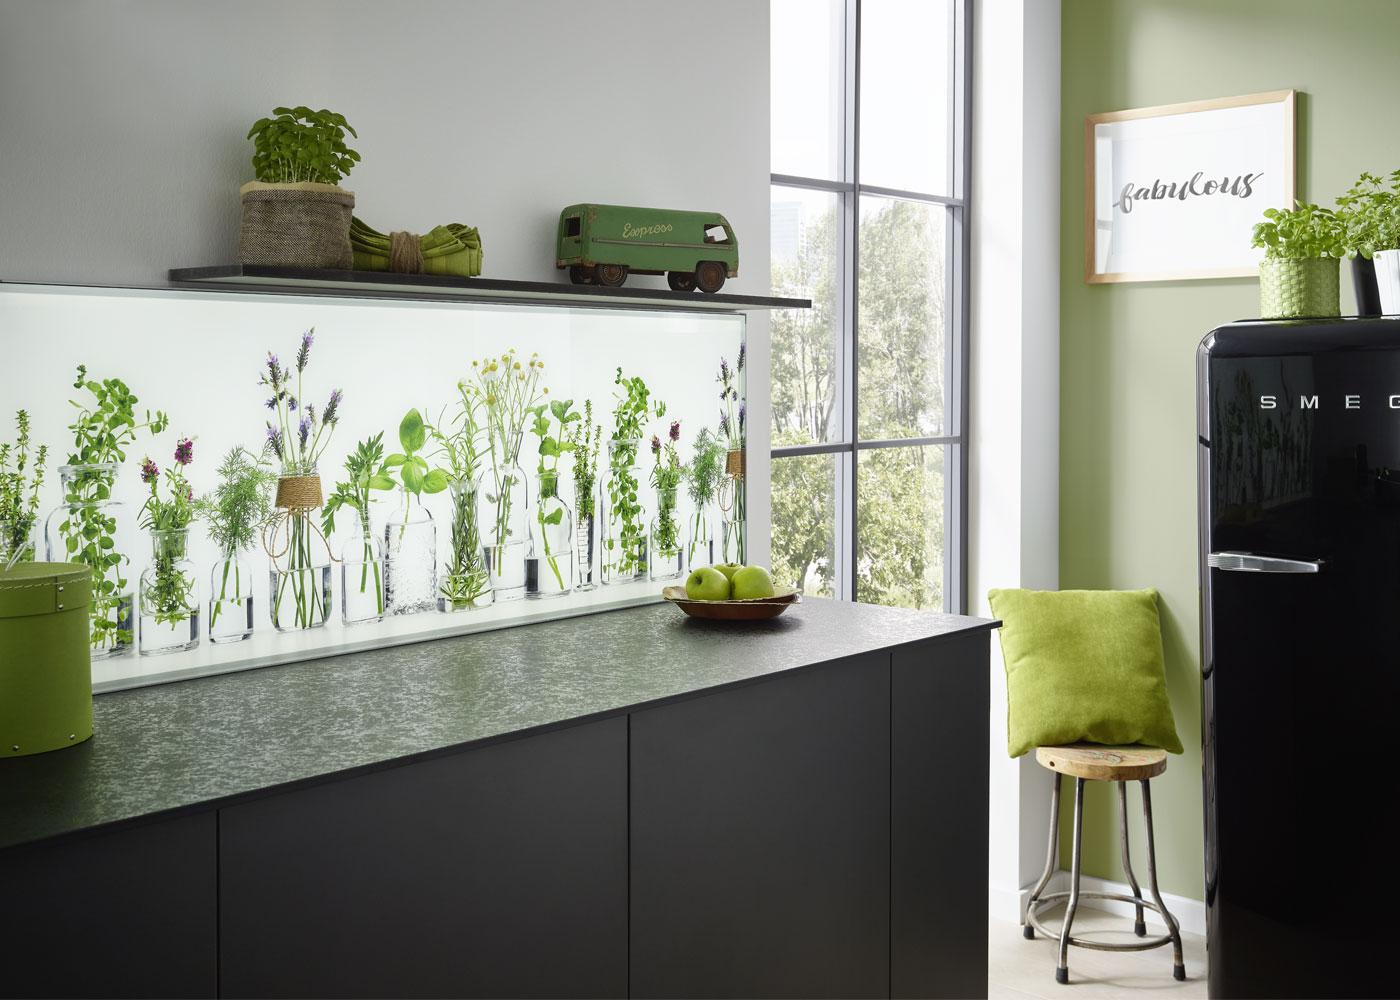 Full Size of Led Panel Küche Unterbau Osram Led Panel Küche Led Panel Küchenschrank Deckenlampe Küche Led Panel Küche Led Panel Küche